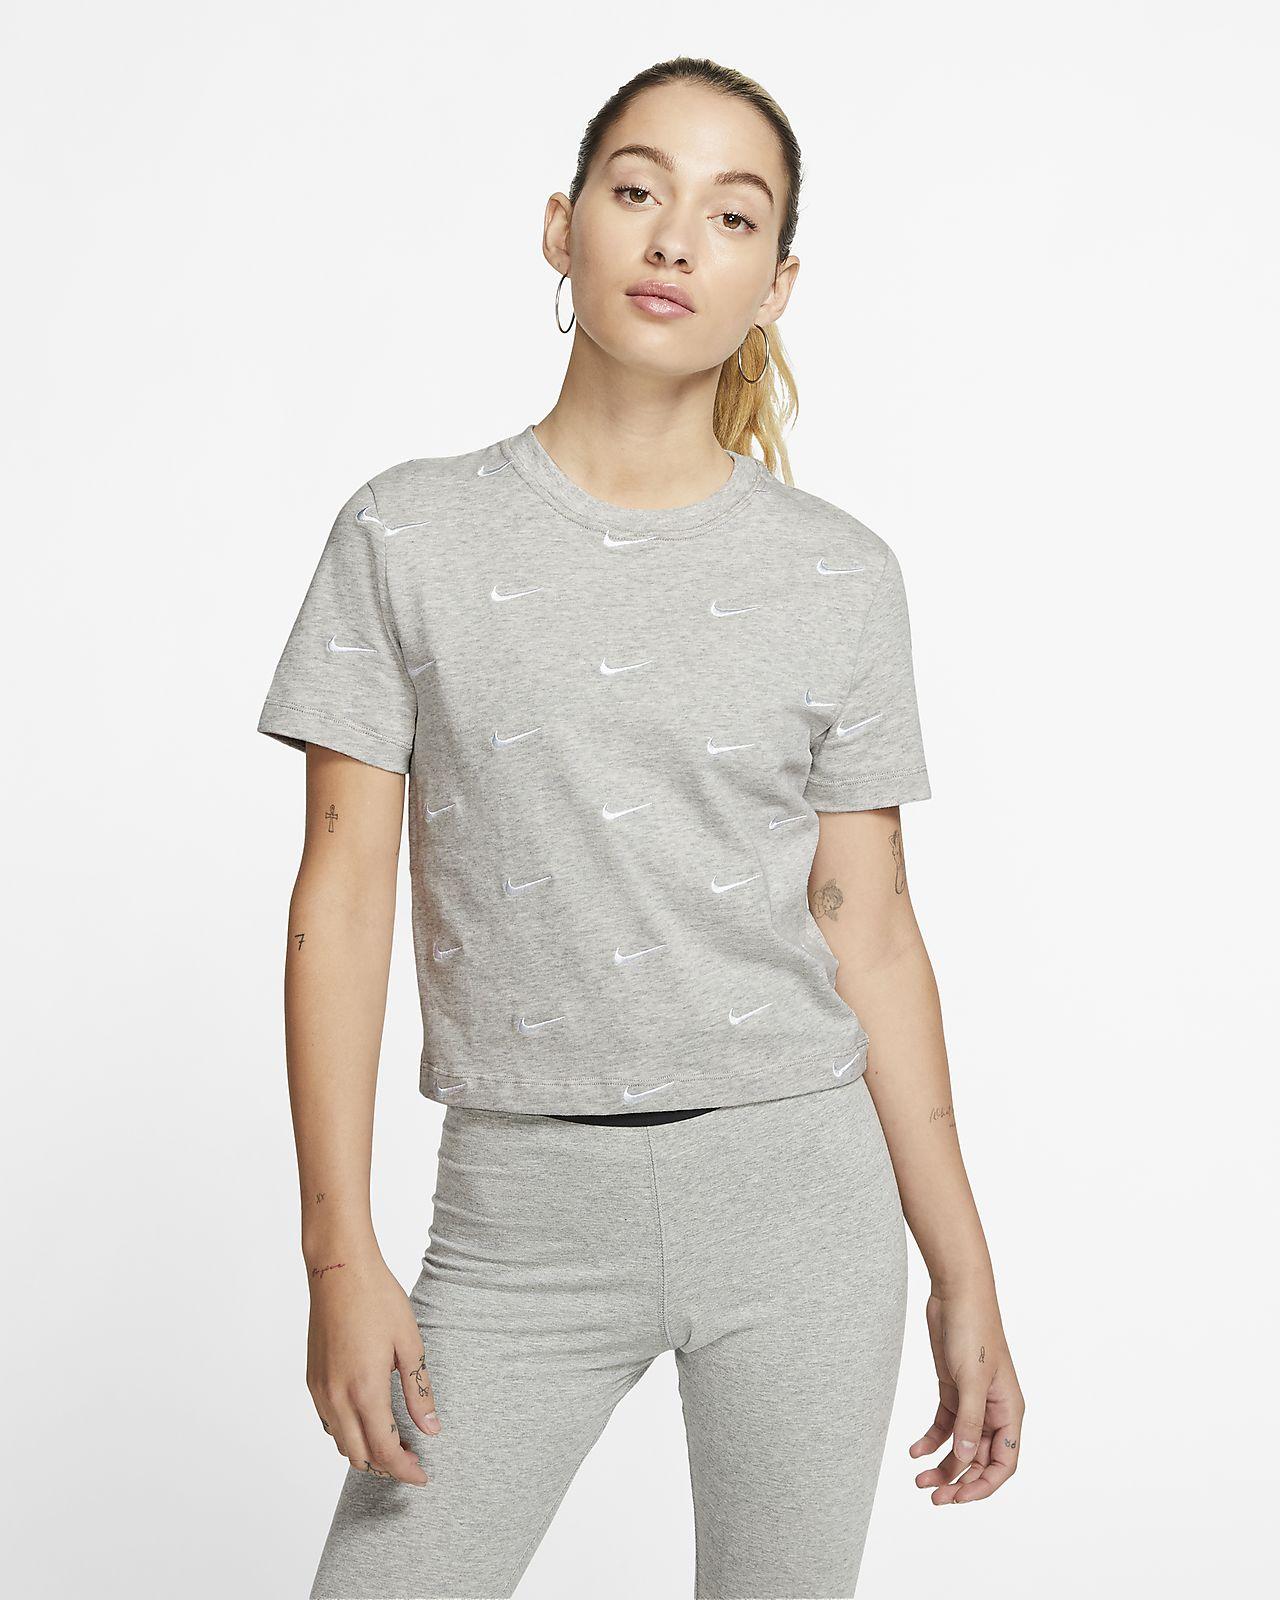 T-shirt Nike con logo Swoosh - Donna